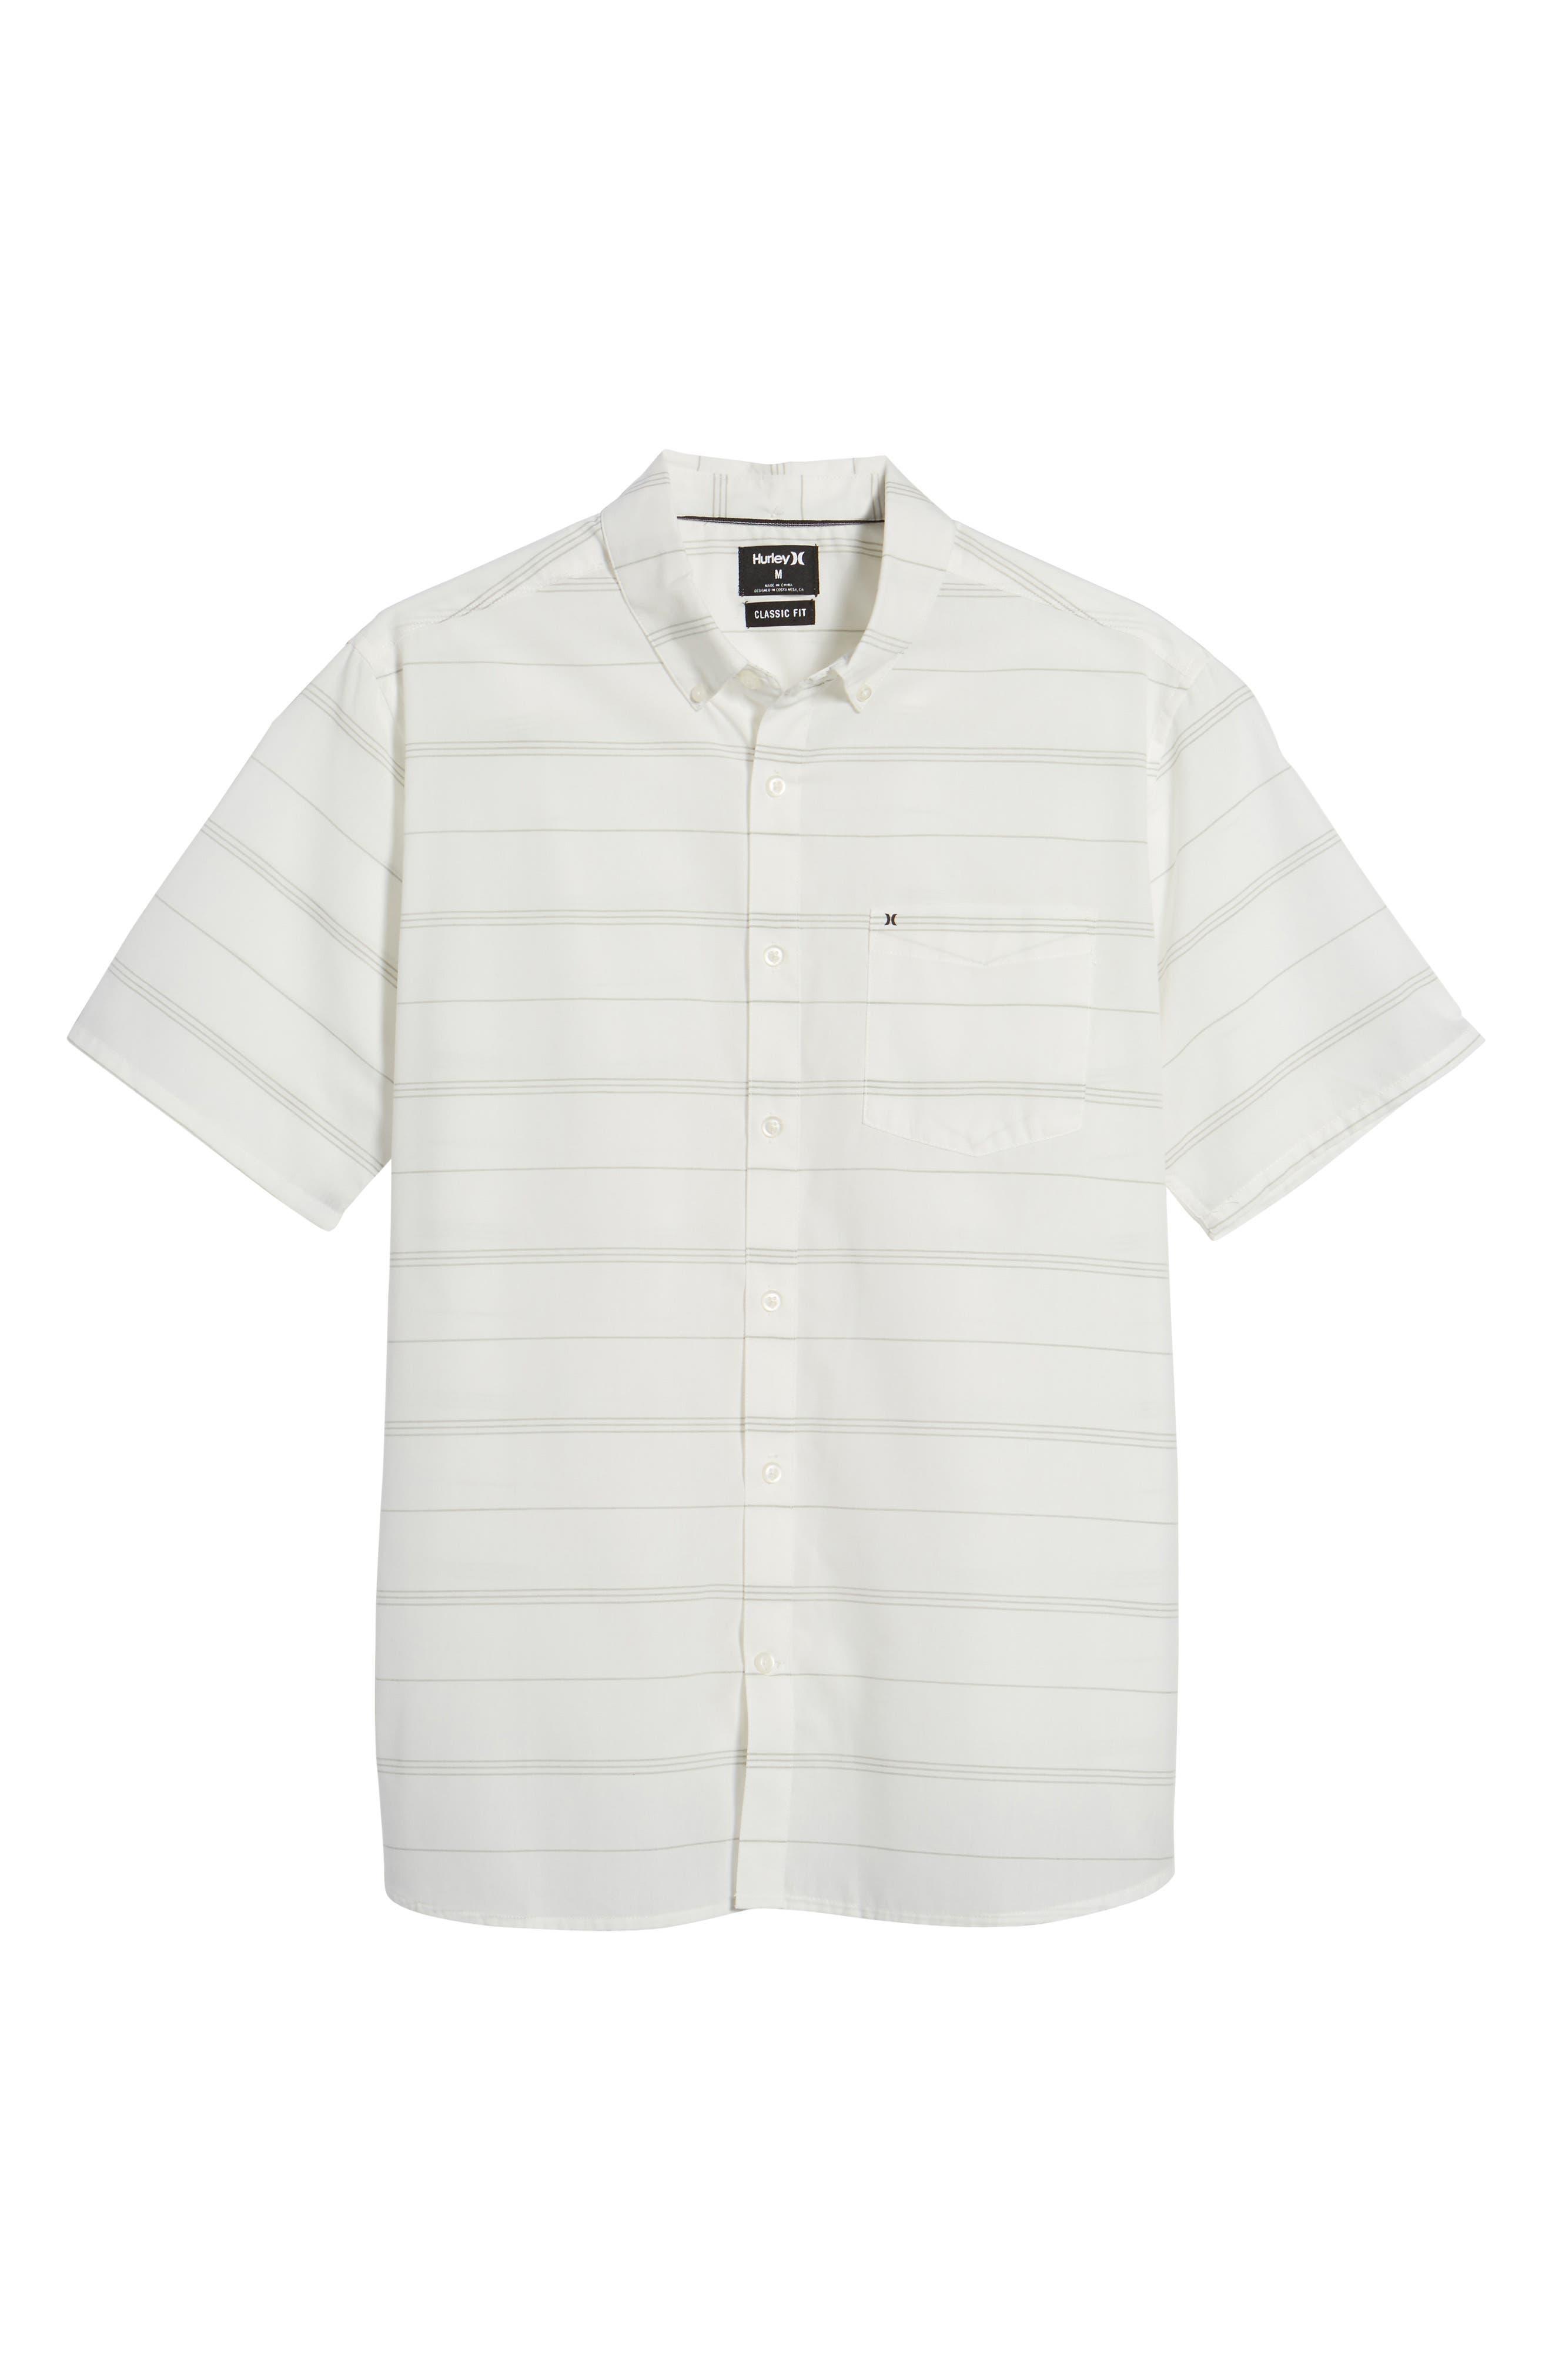 Dri-FIT Rhythm Shirt,                             Alternate thumbnail 6, color,                             Sail